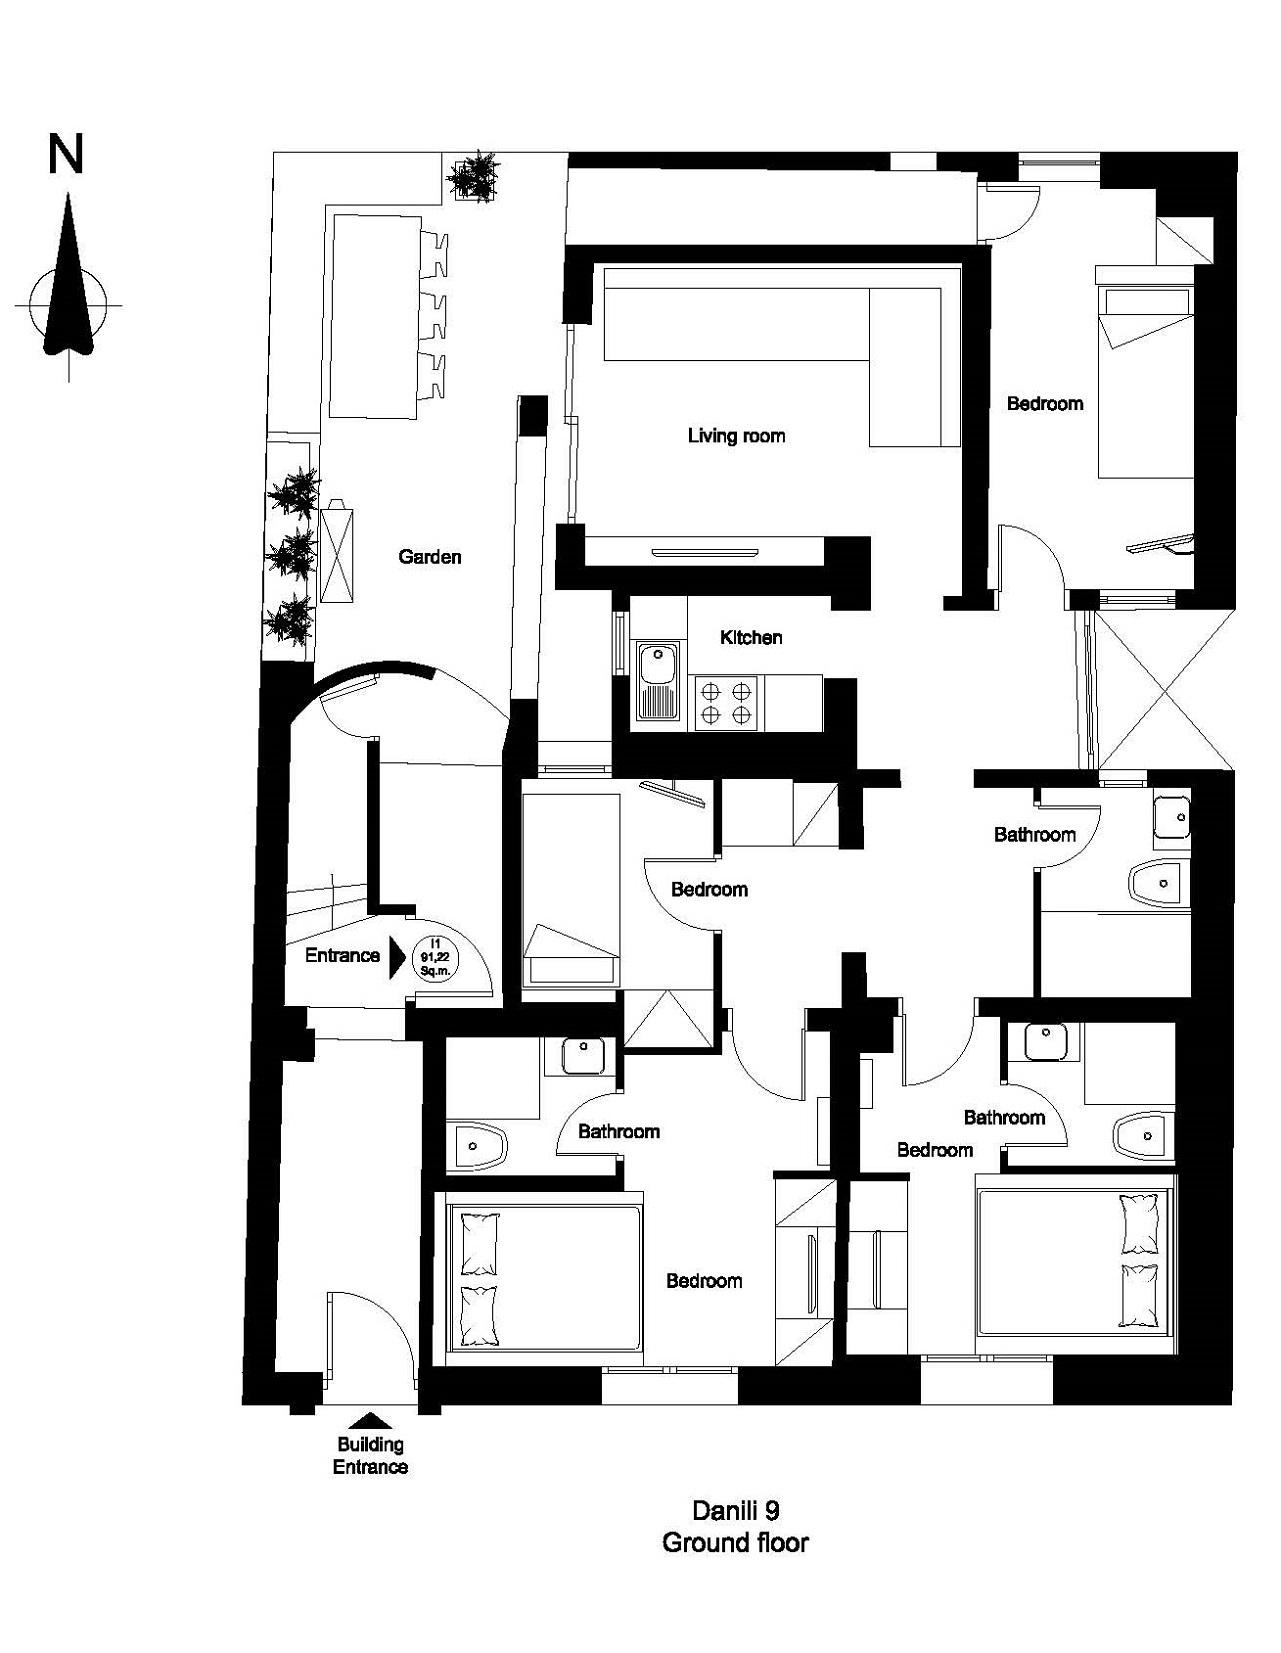 Danili 9 ground floor plan